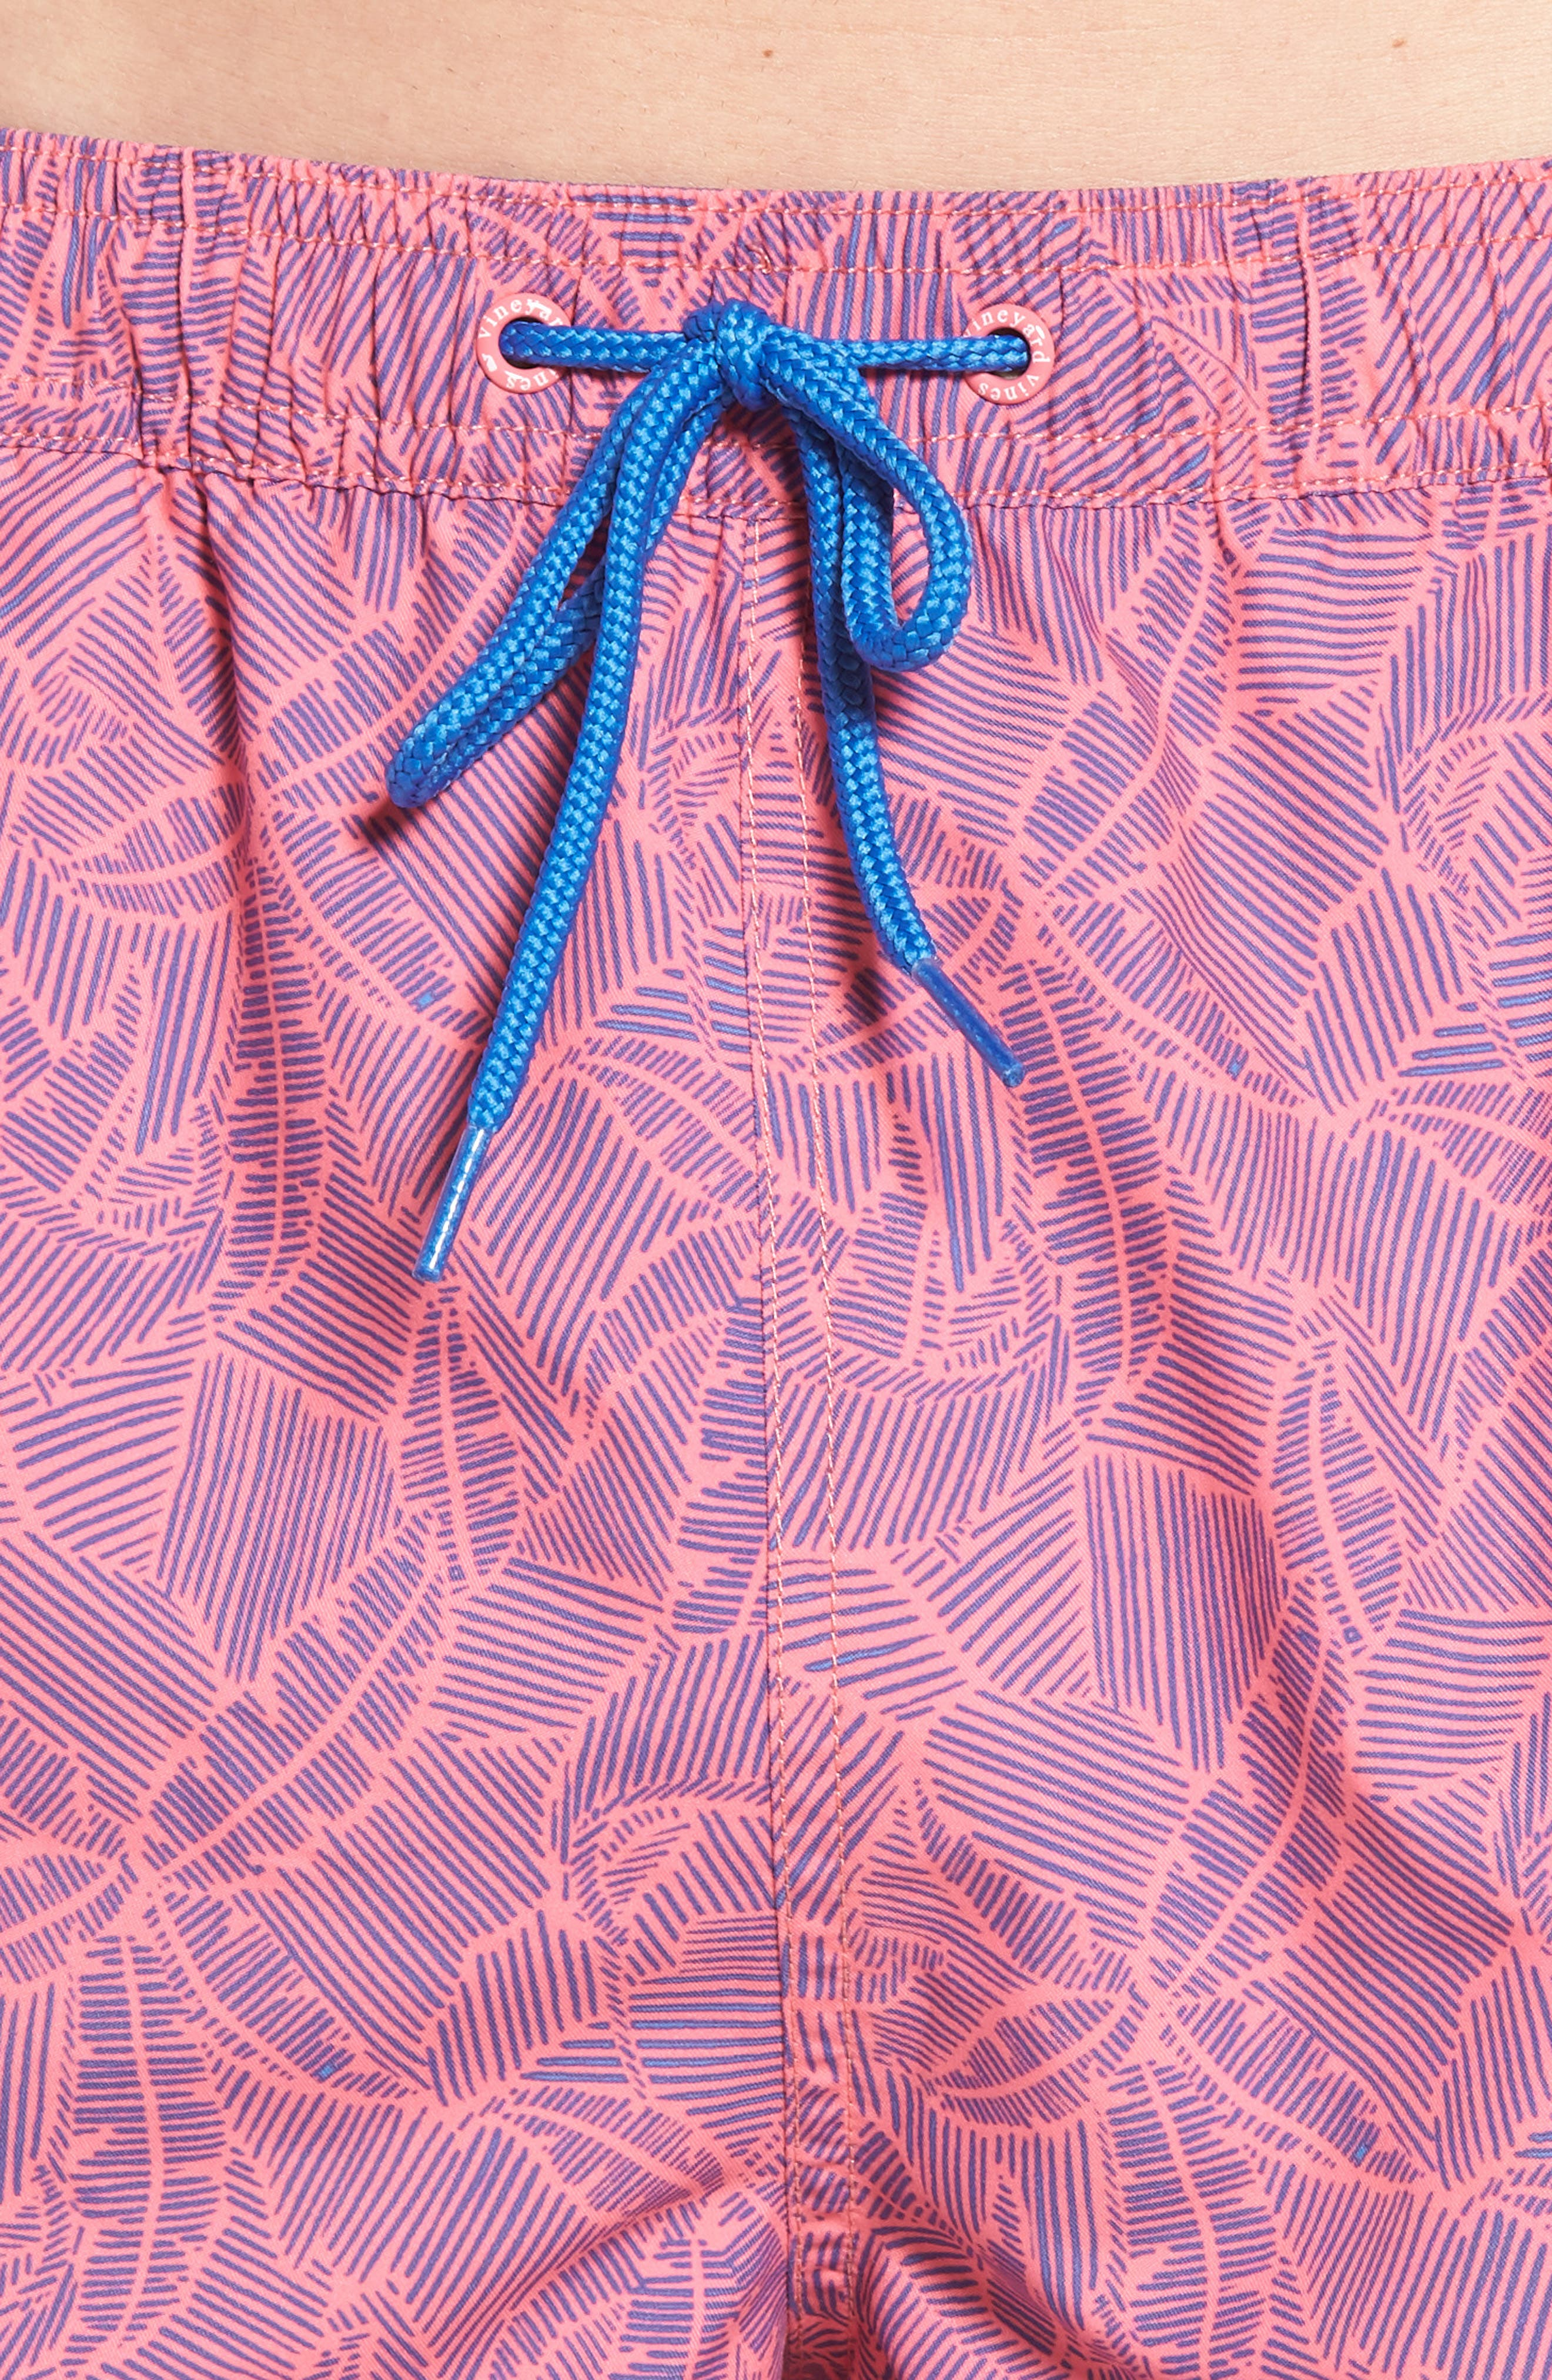 Linear Tropics Chappy Swim Trunks,                             Alternate thumbnail 4, color,                             650